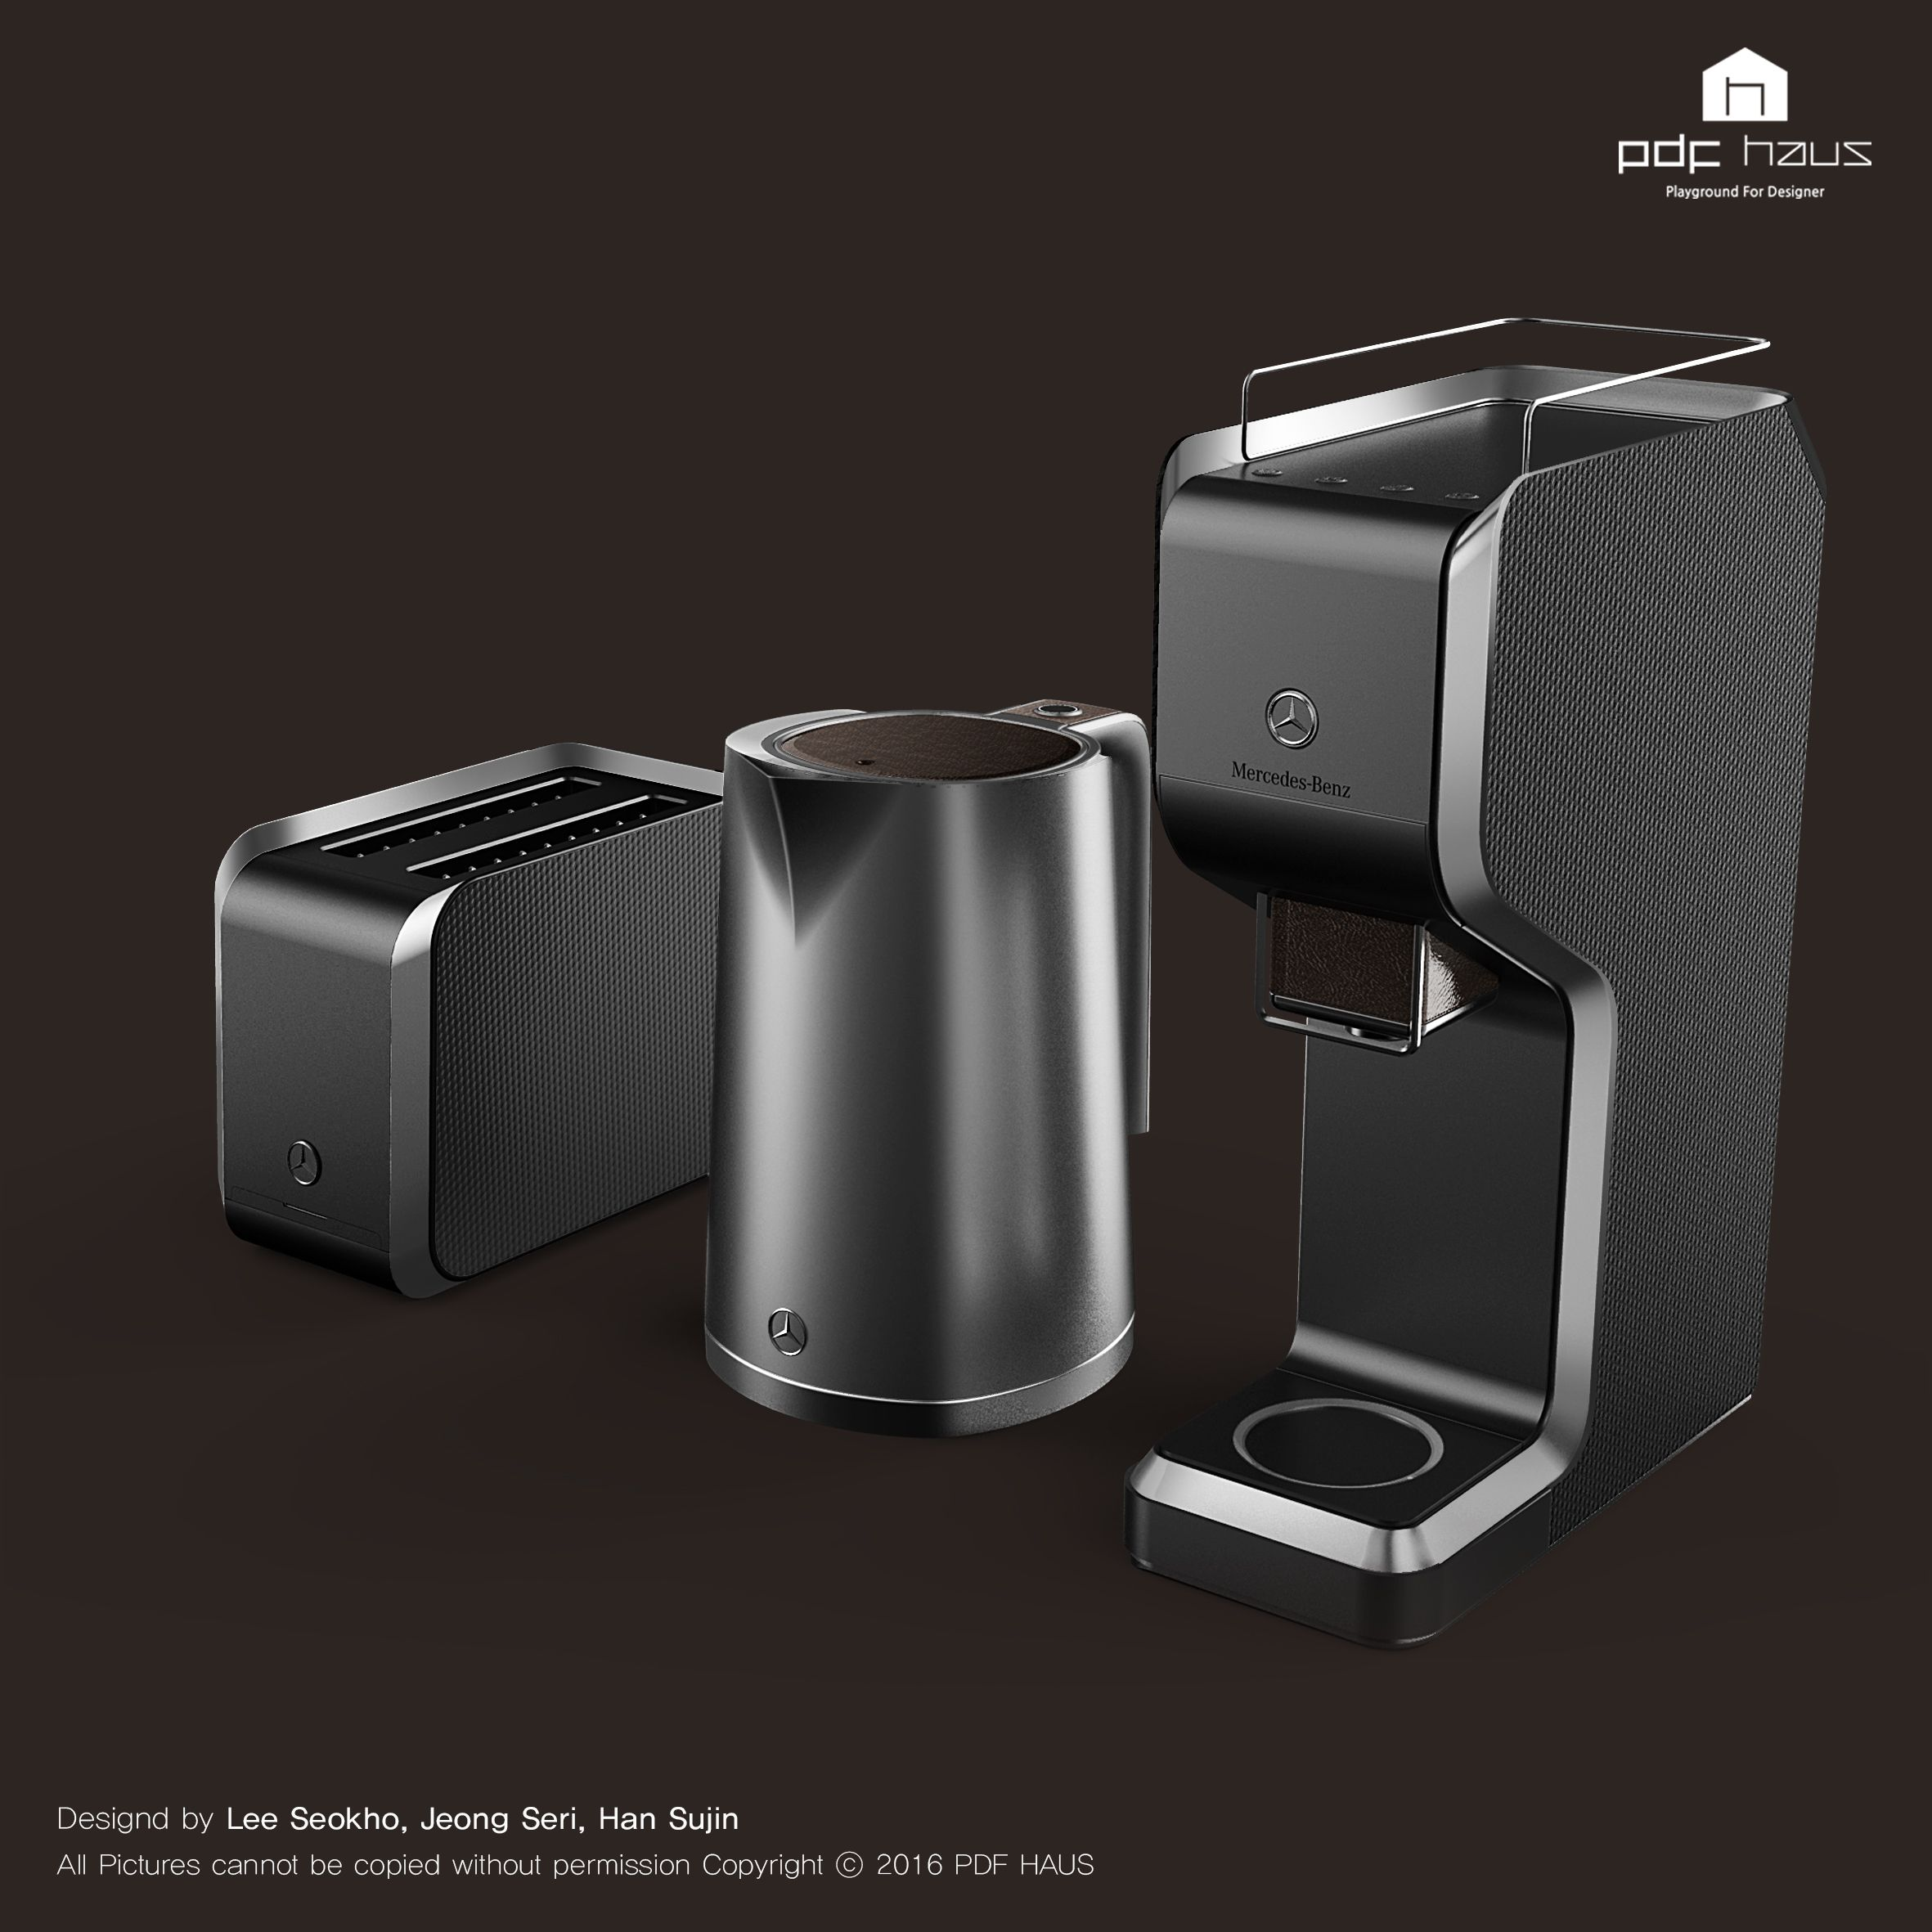 Benz / Kitchen Appliance / Product Design / Industrial